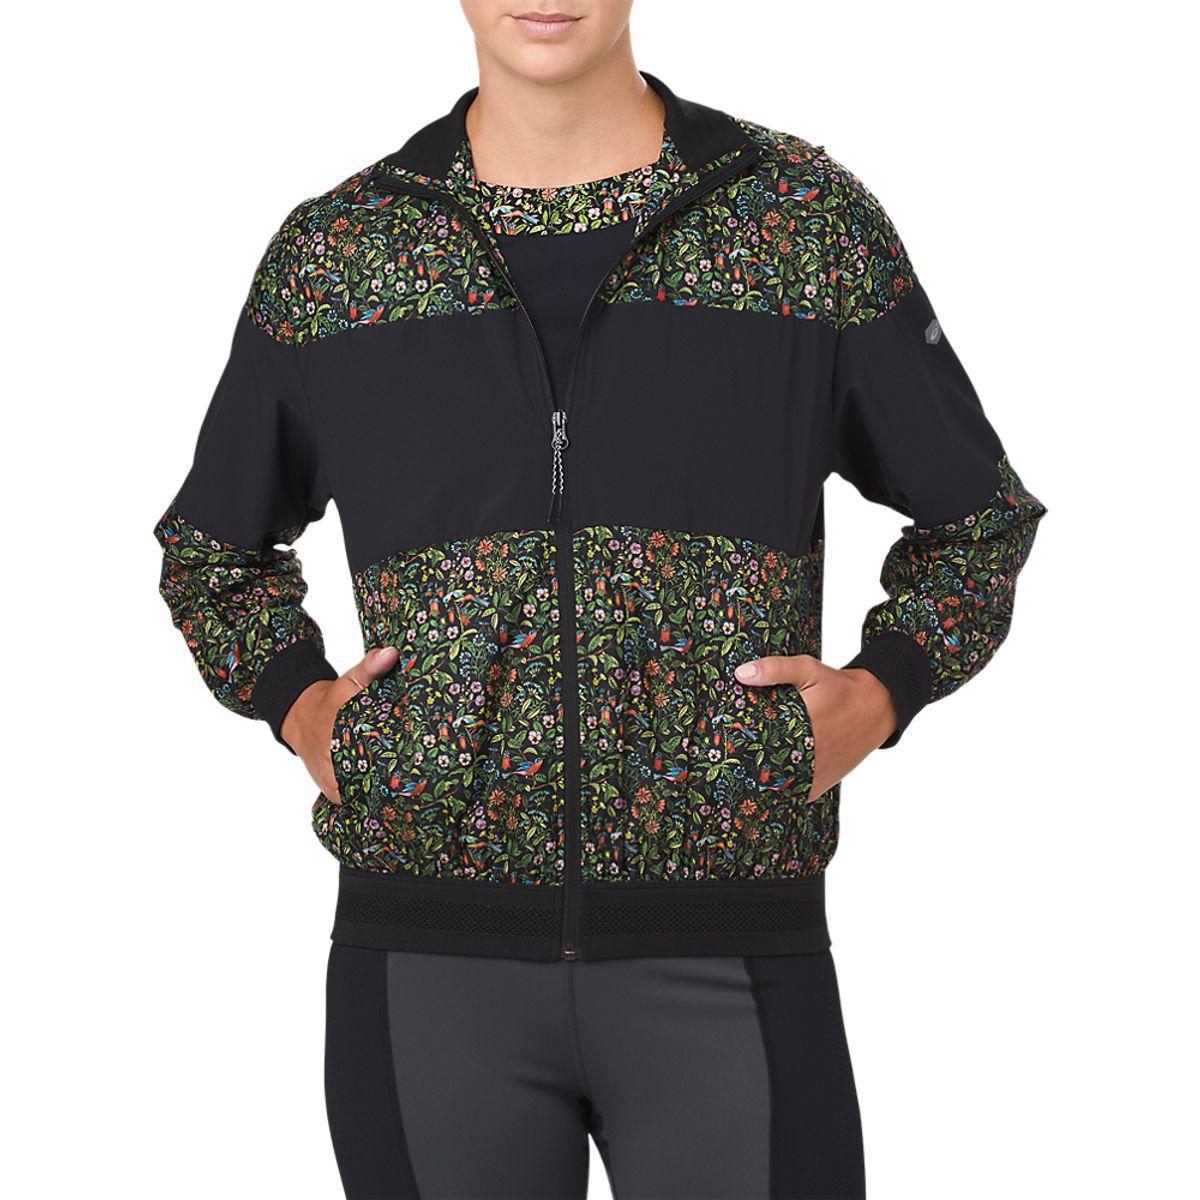 Jaqueta-Asics-Liberty-Fabrics---Feminino---Preto